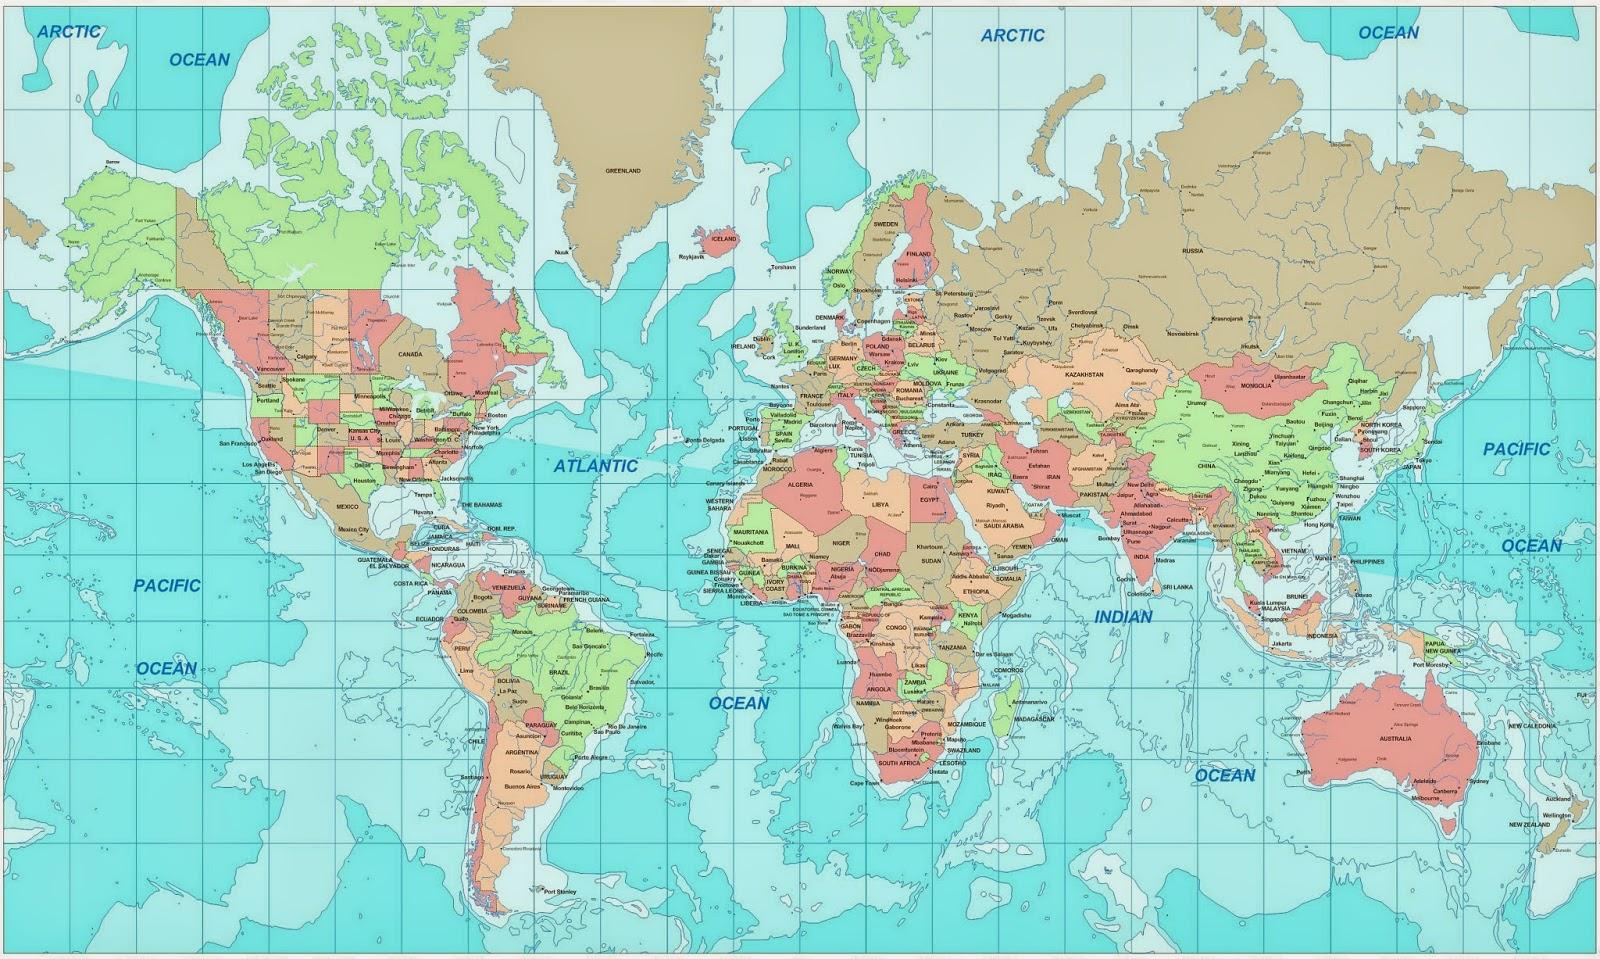 free printable world atlas map free printable world atlas map